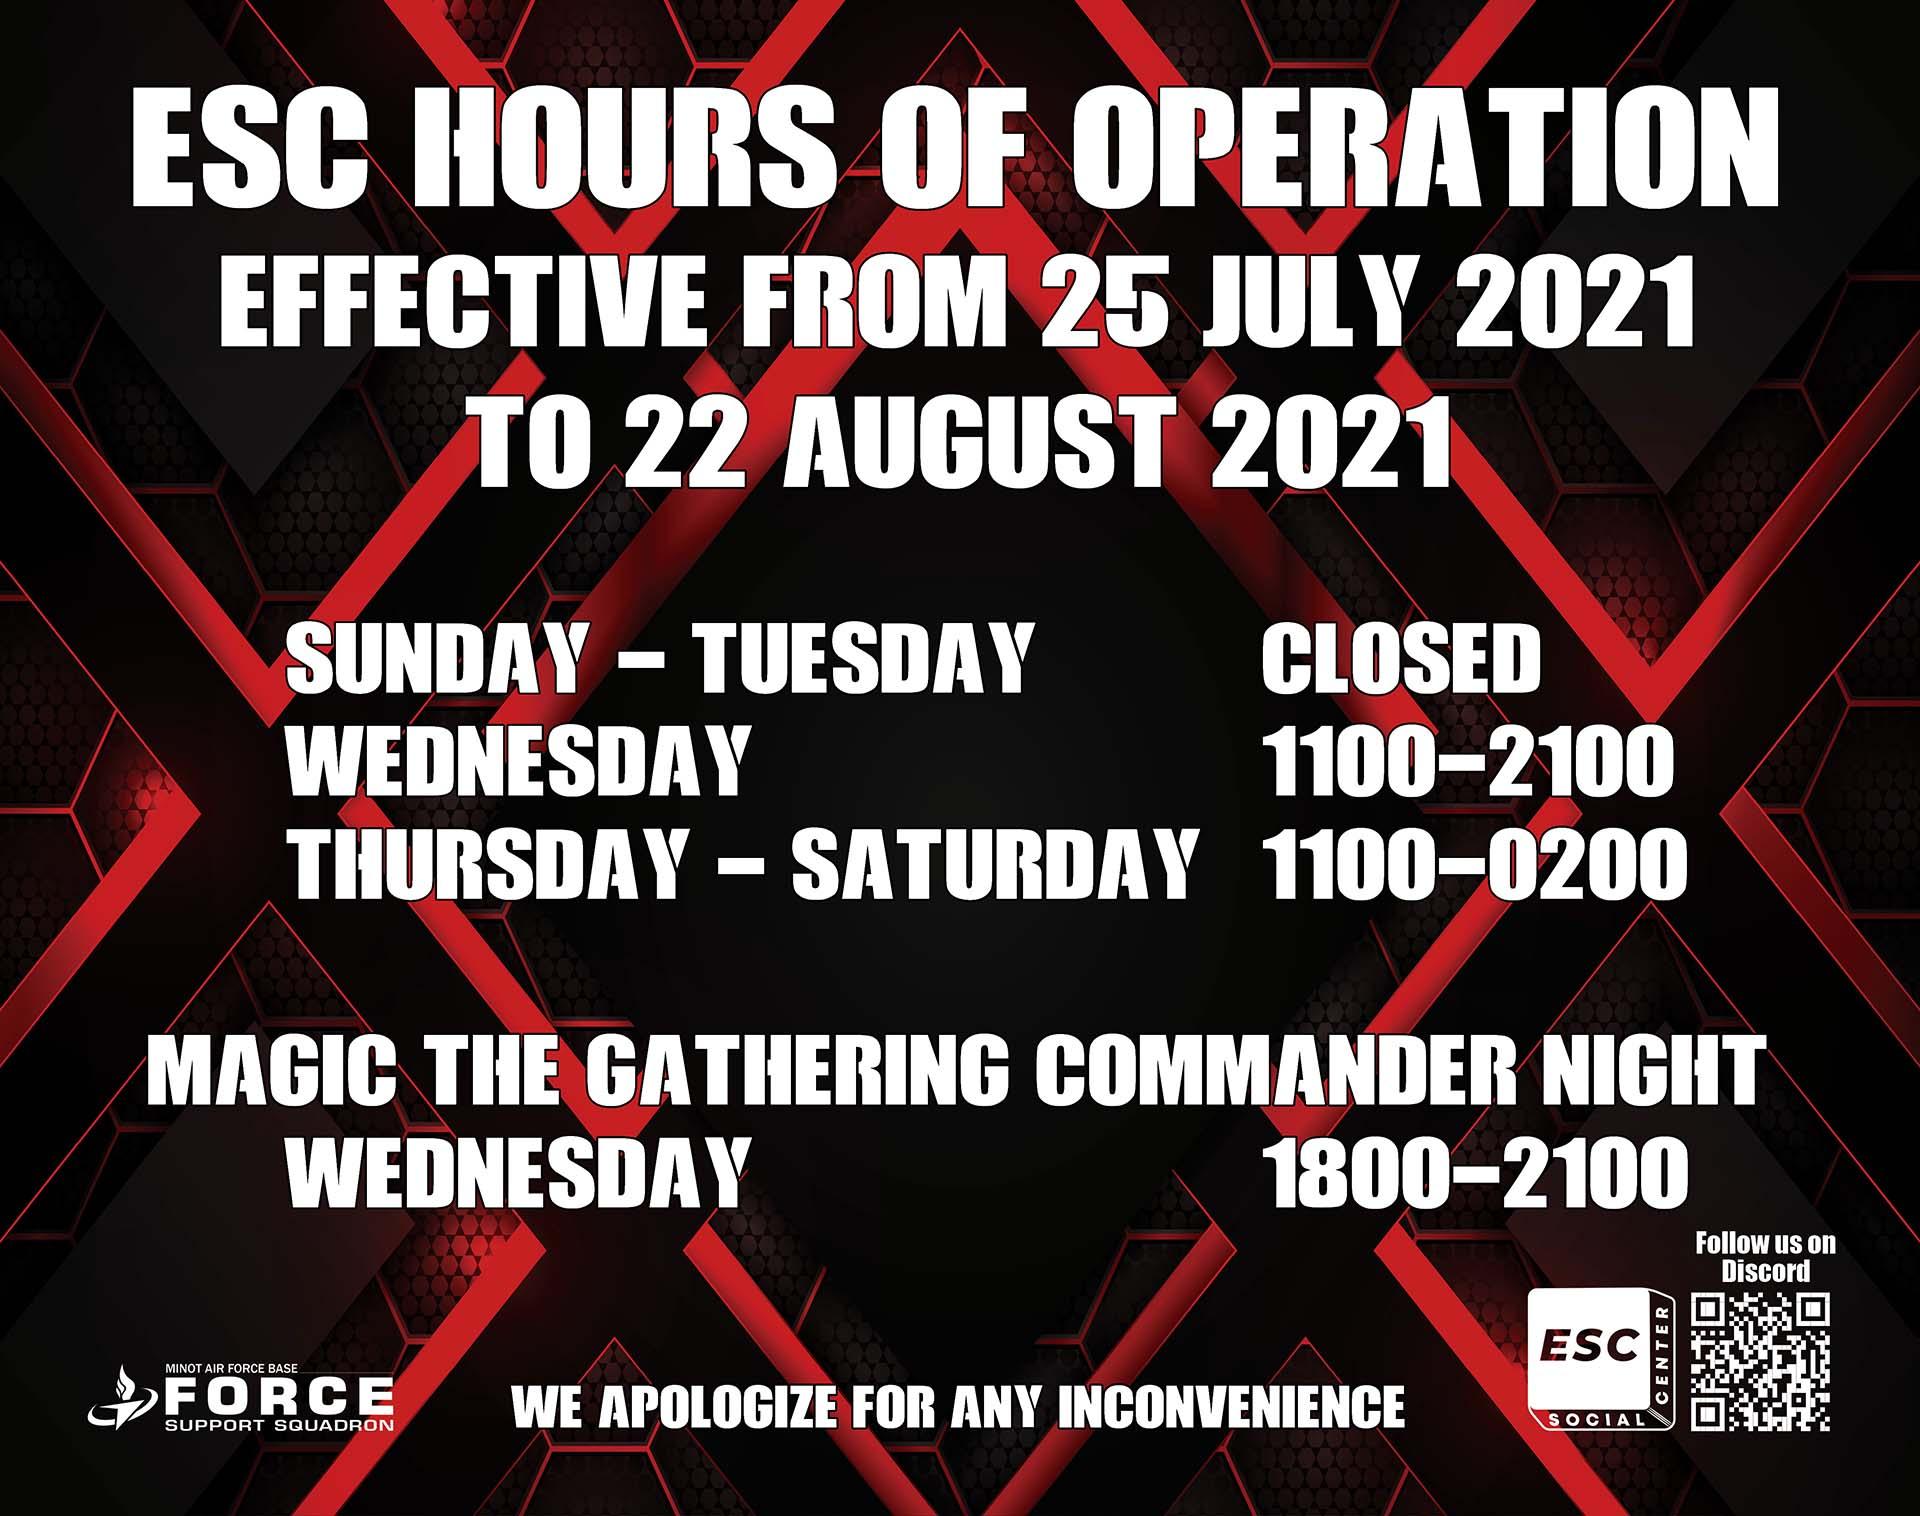 07.25-08.22 ESC Hours of Operation